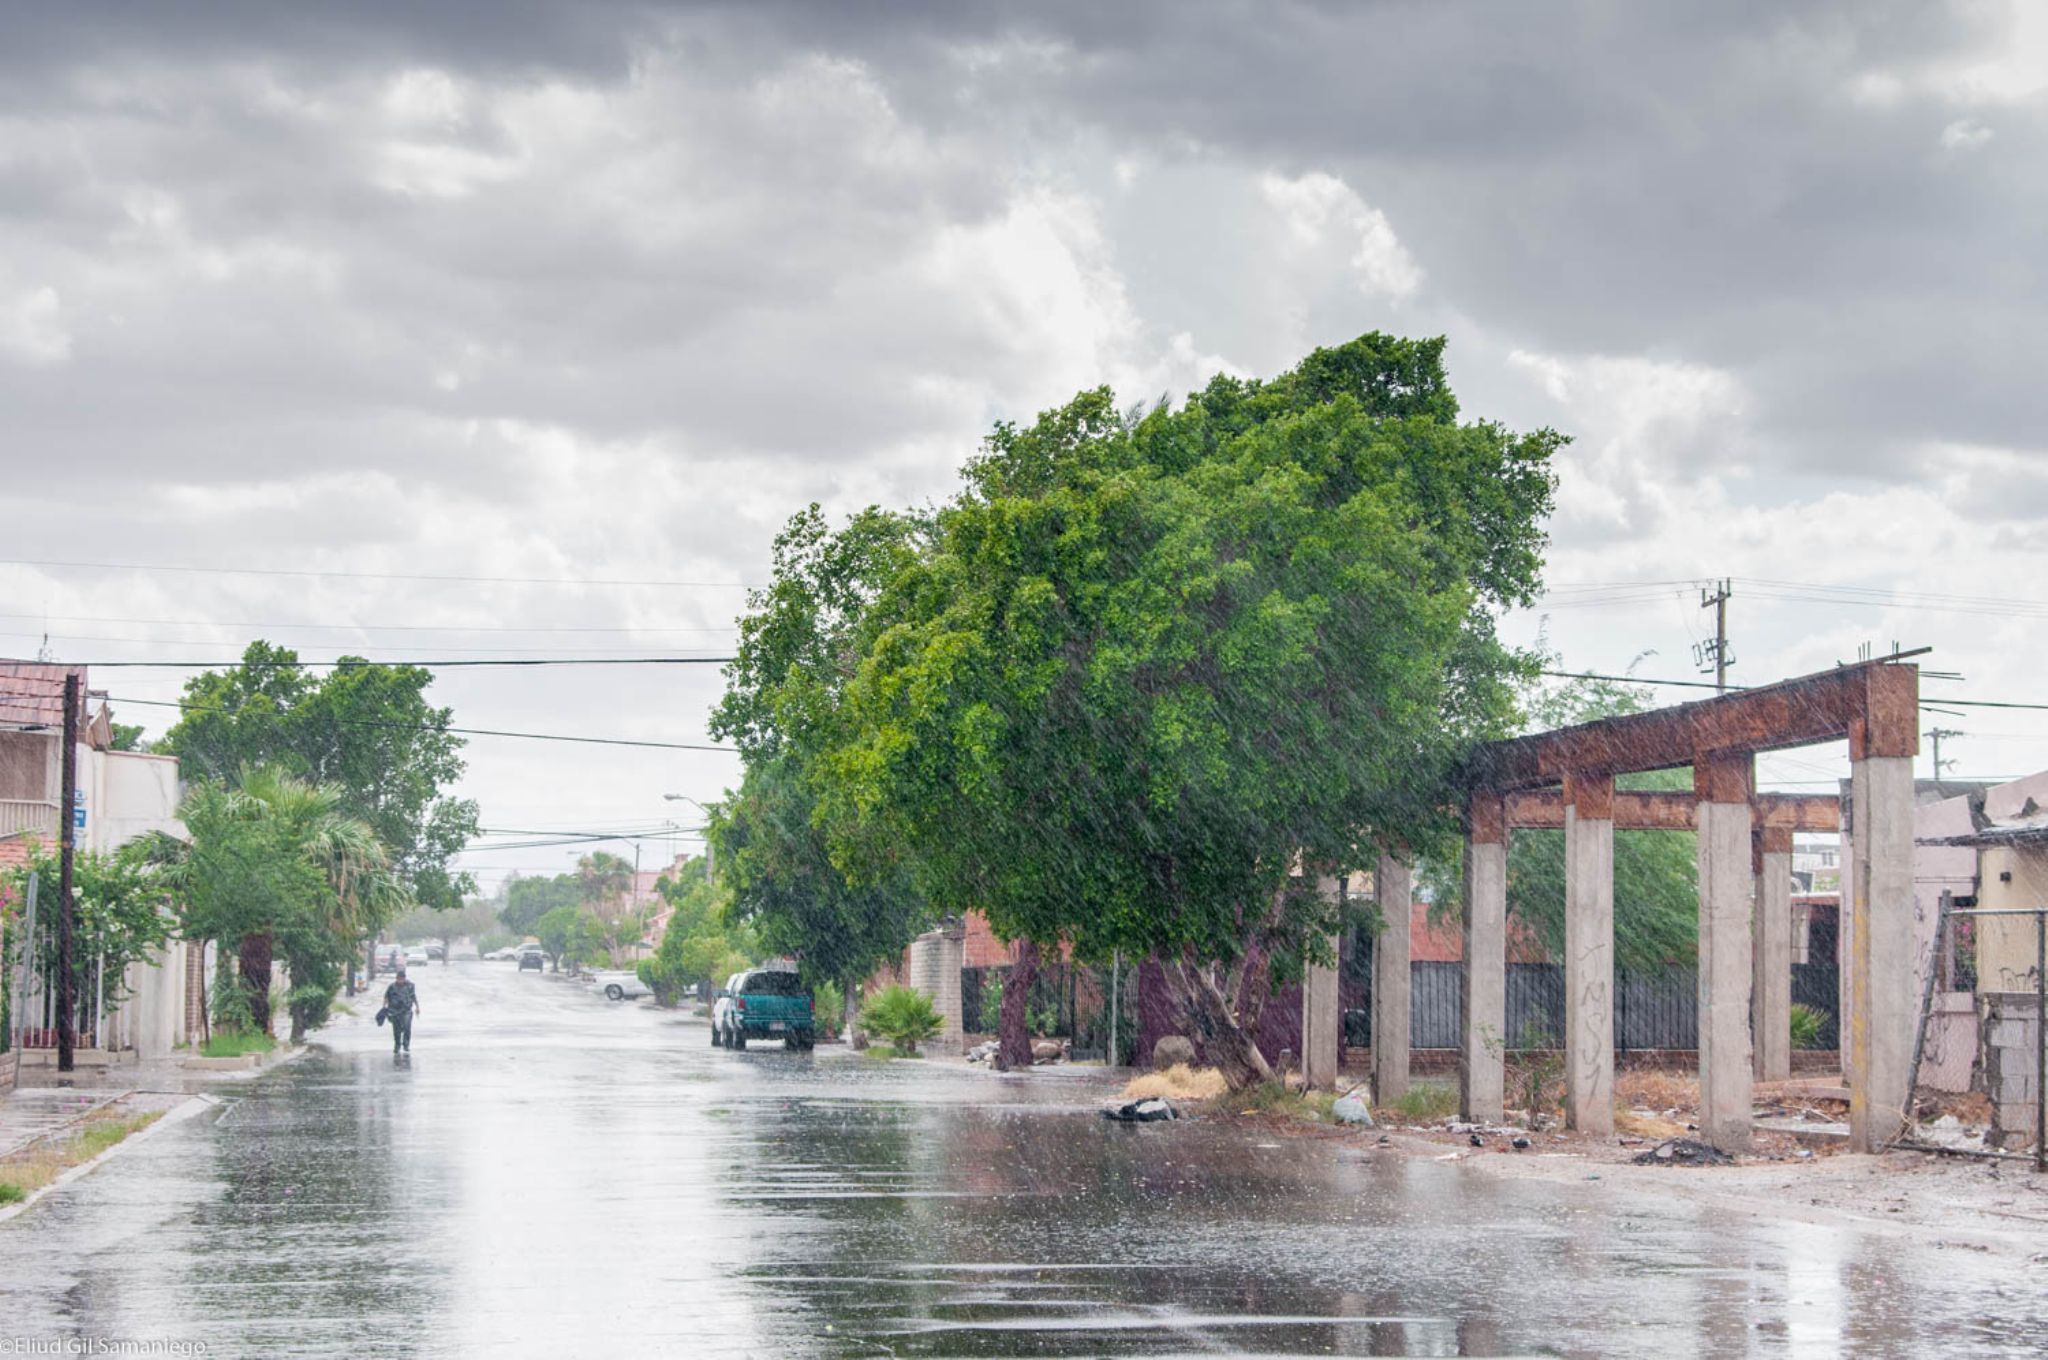 Rainy day (just rained for 10 minutes) by David Eliud Gil Samaniego Maldonado